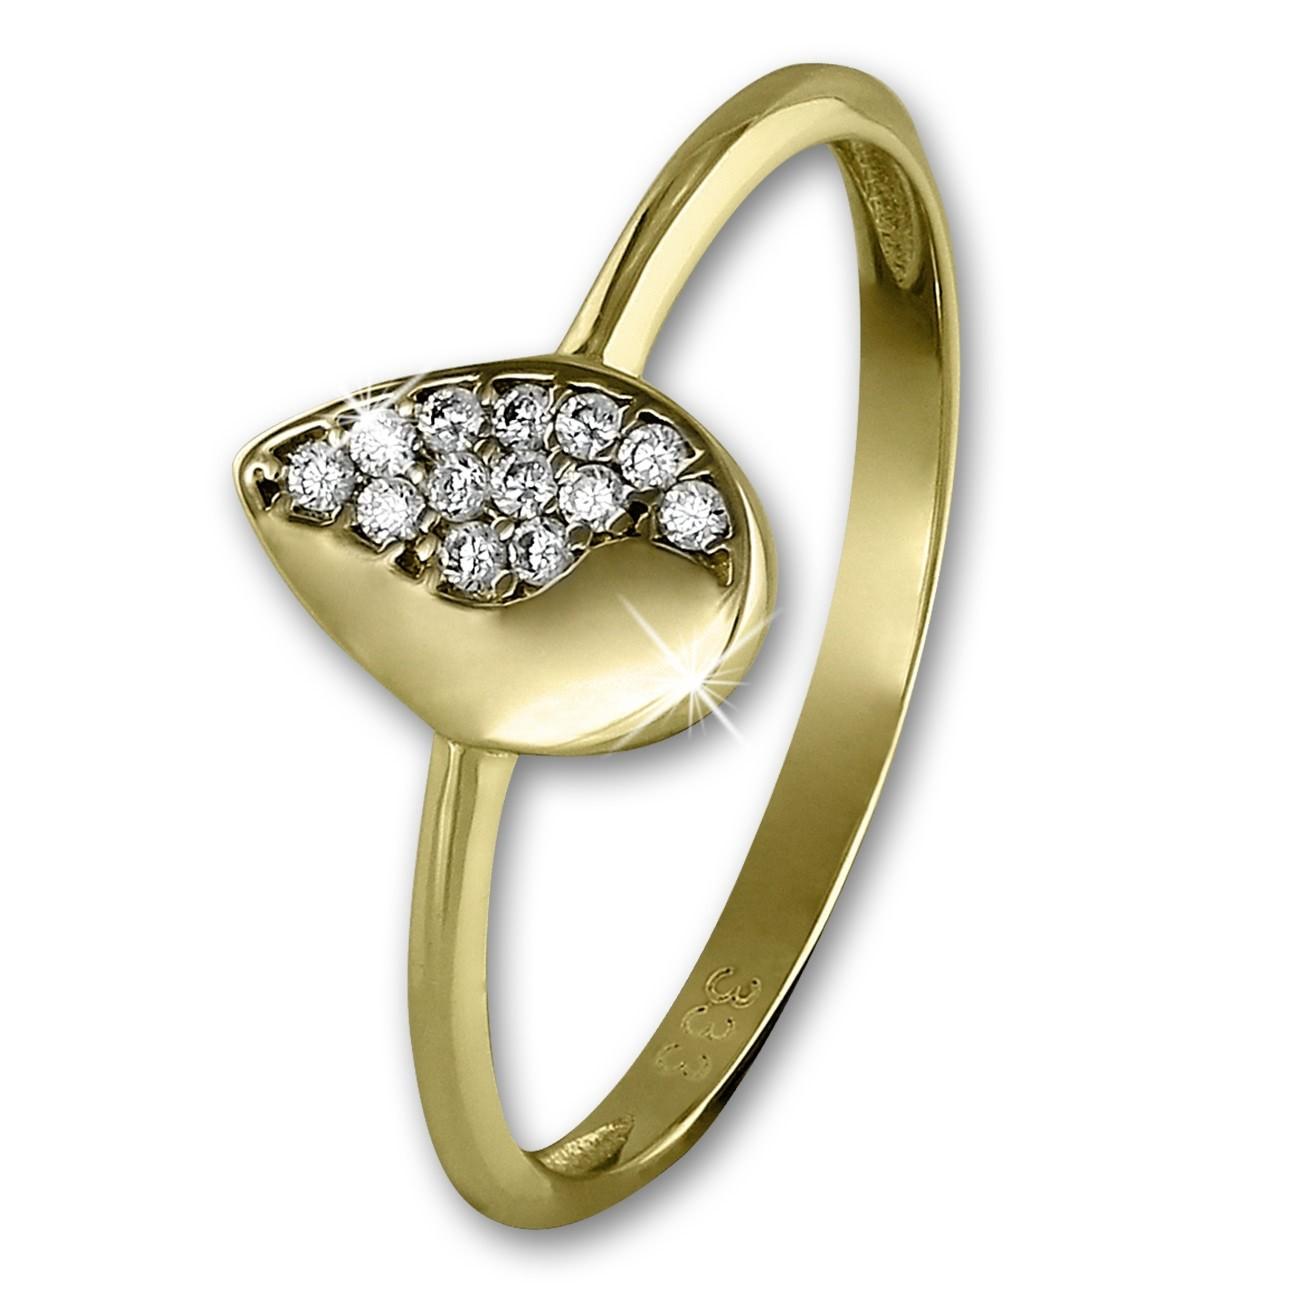 GoldDream Gold Ring Blatt Zirkonia weiß Gr.56 333er Gelbgold GDR506Y56